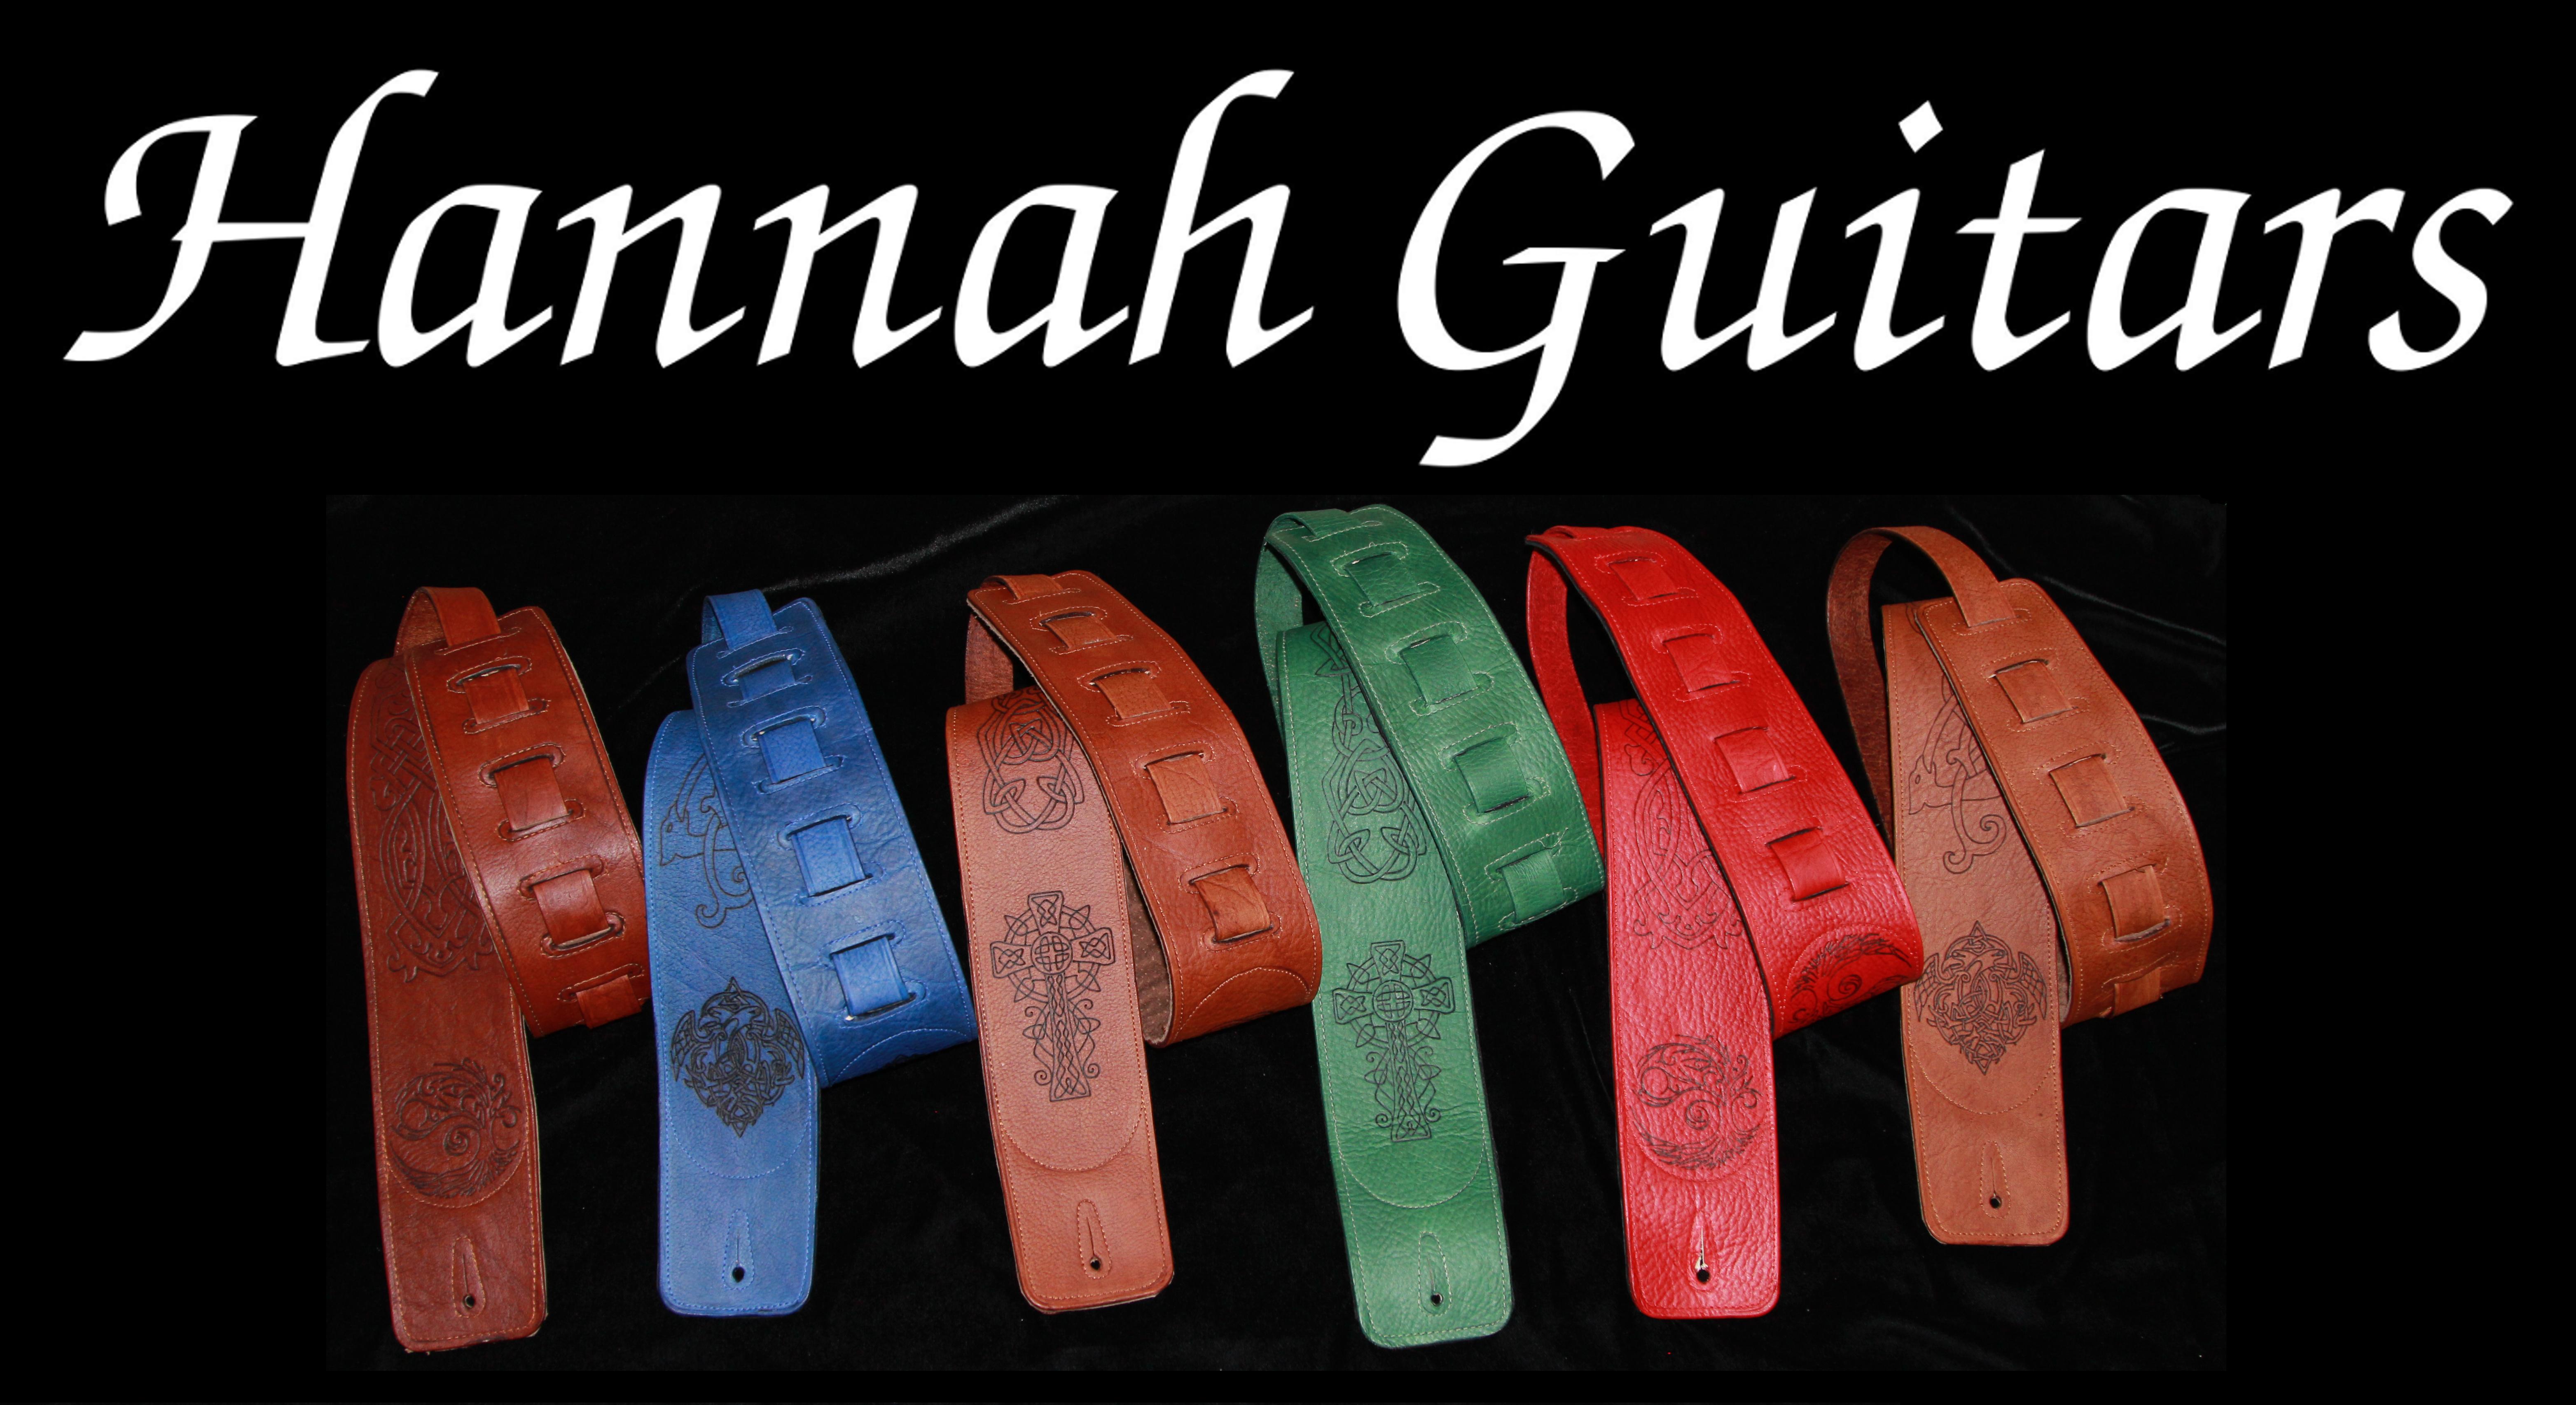 HannahGuitars 7 straps white text